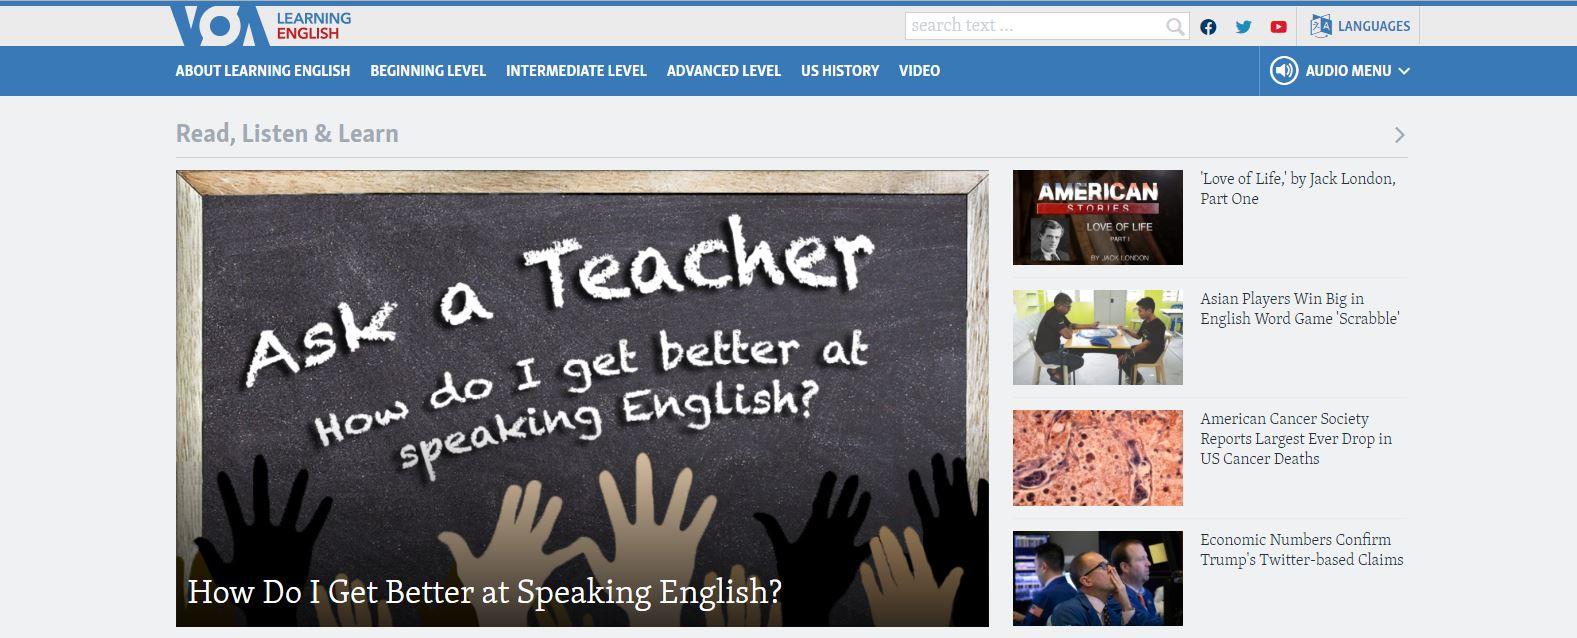 مجموعه پادکست انگلیسی Learning English from Voice of America News